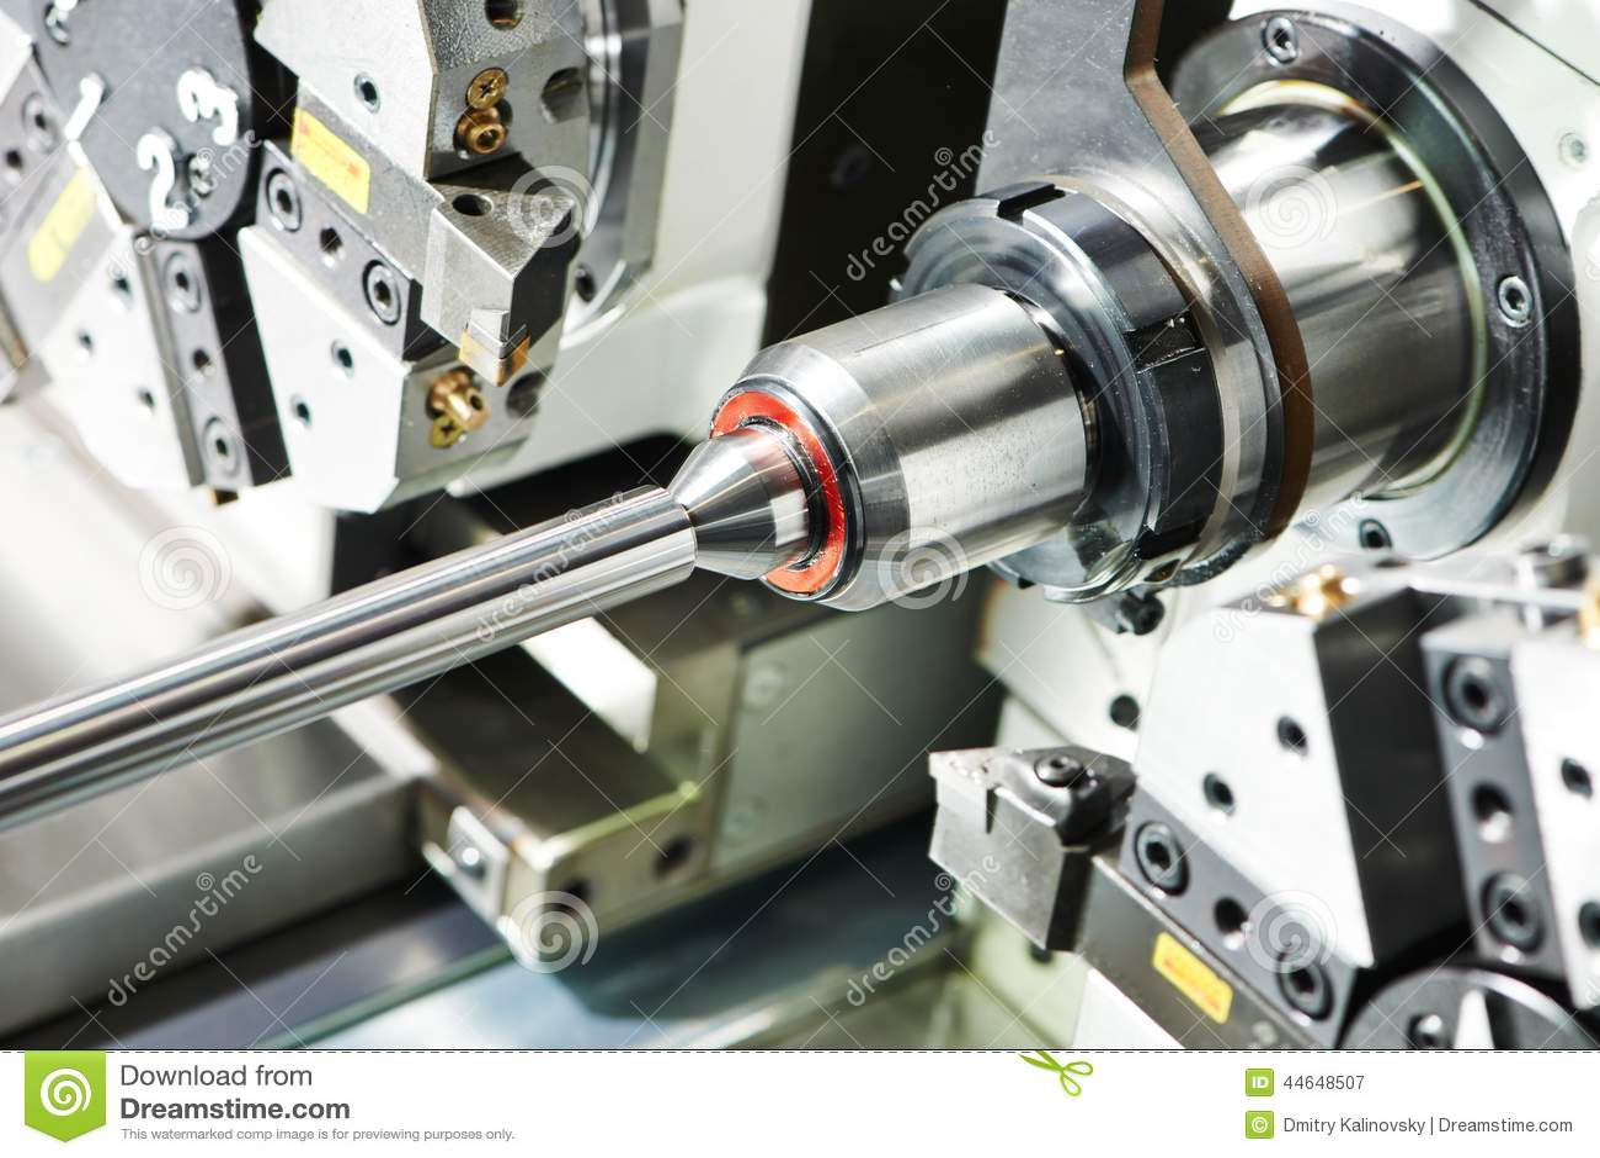 Metal Turning Process On Machine Tool Stock Photo - Image: 44648507